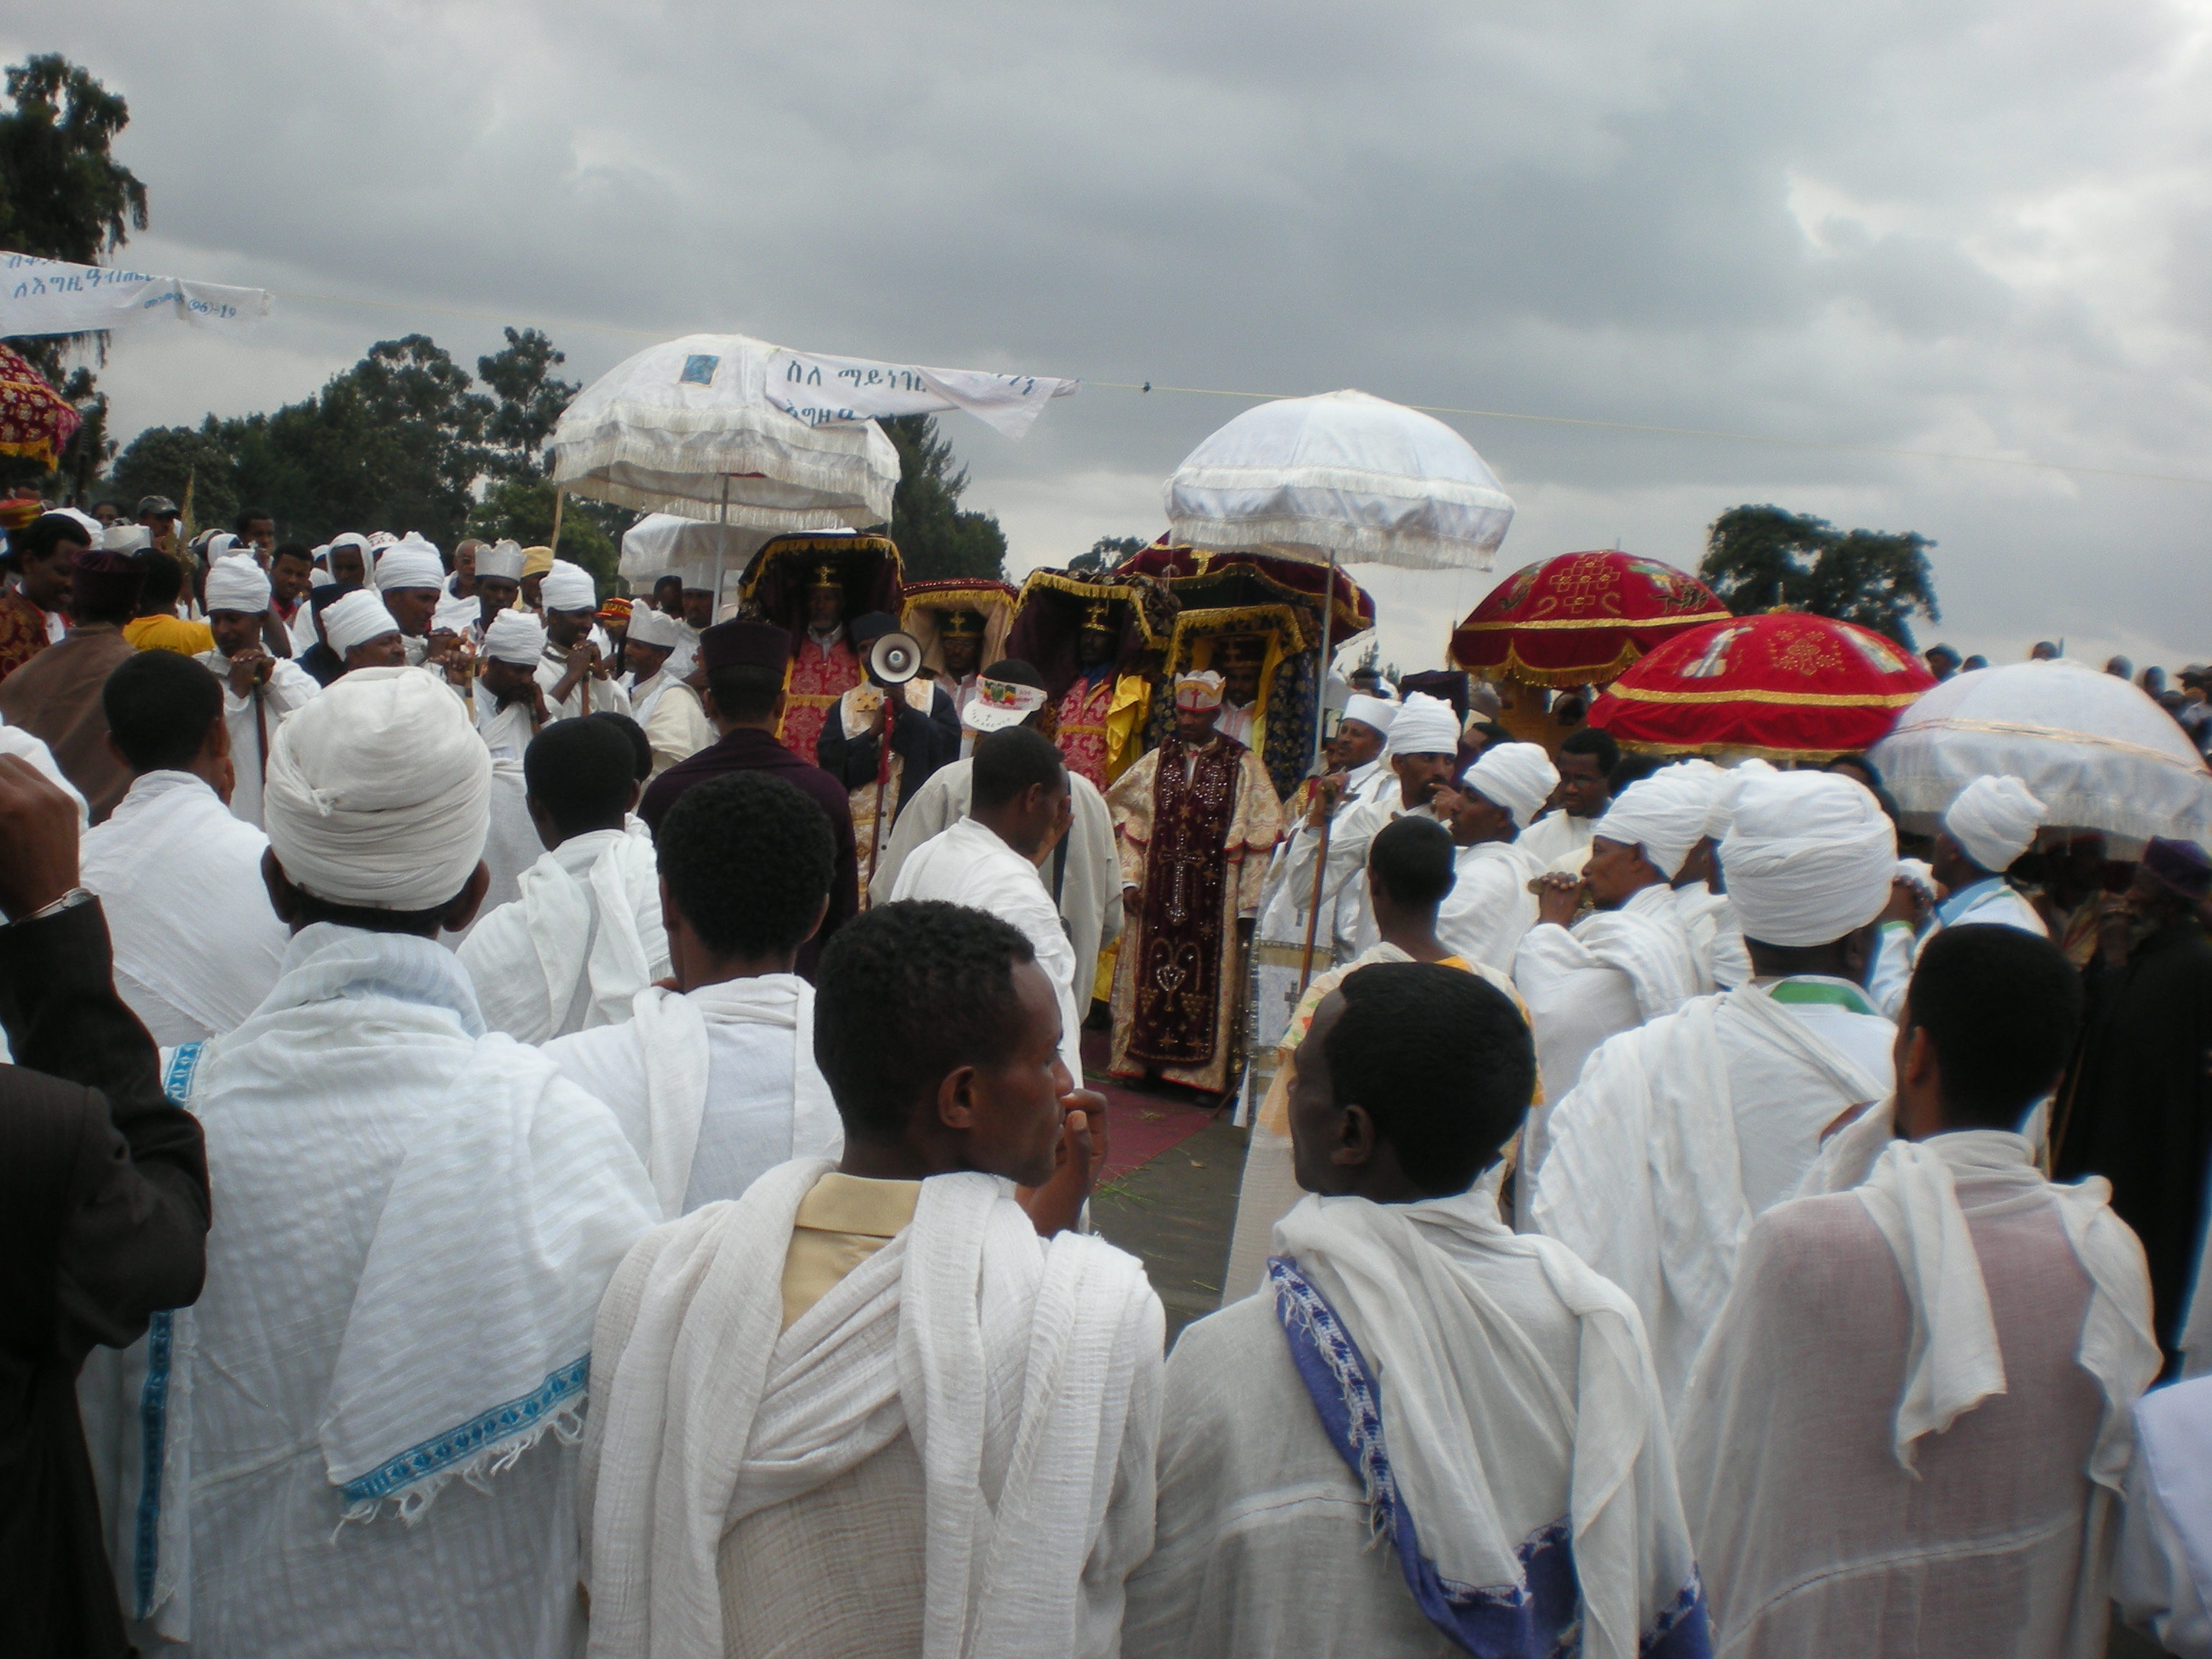 Ethiopian Orthodox Fasting Calendar 2016 | Calendar Template 2016